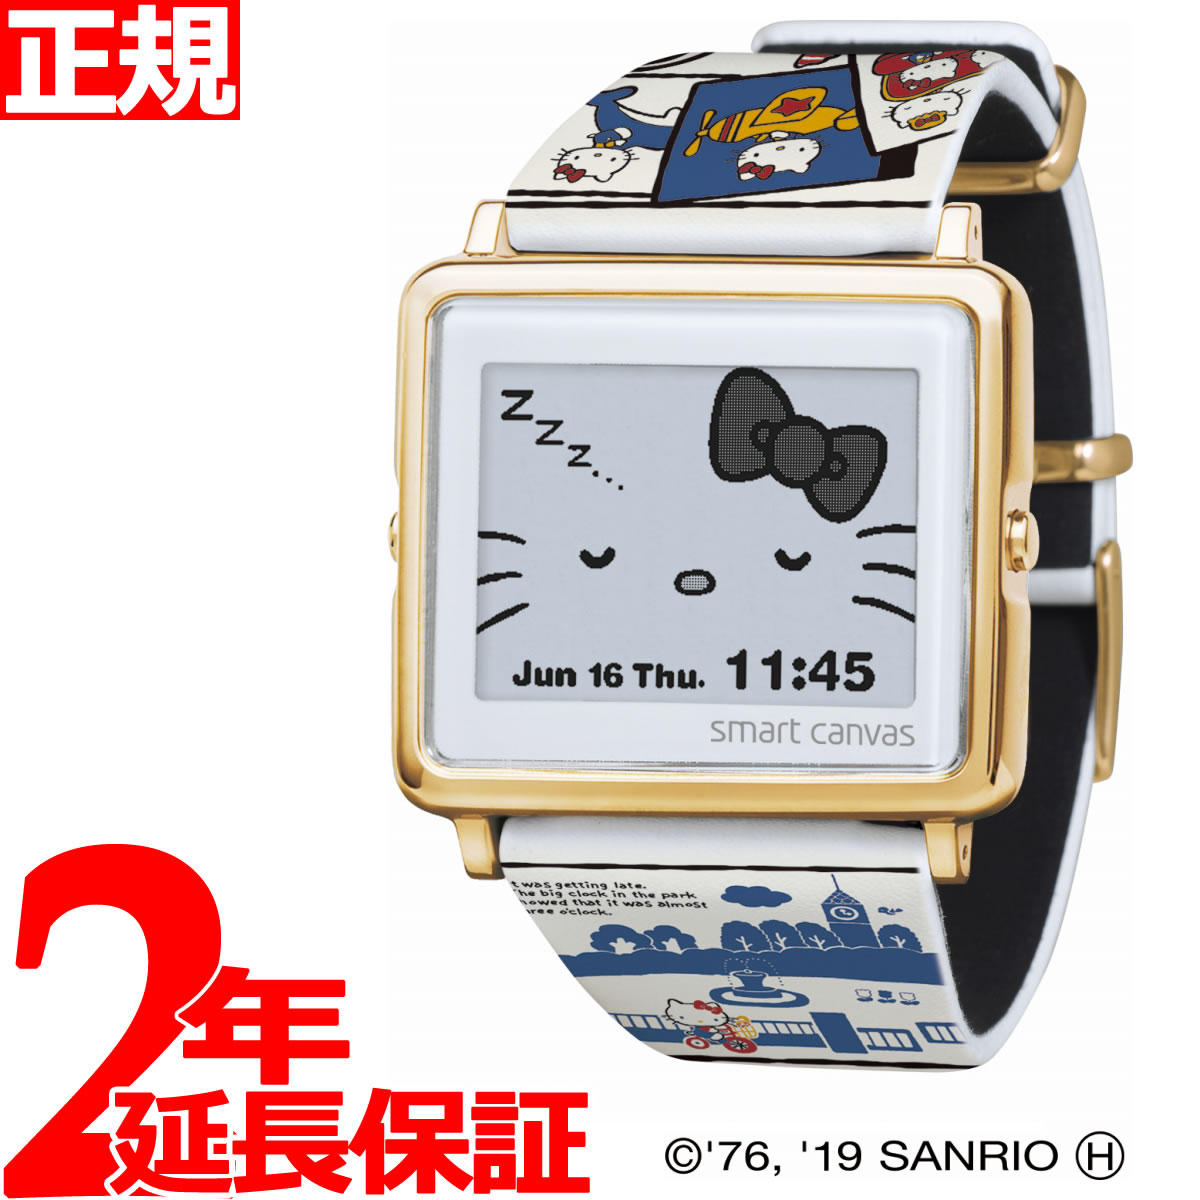 【SHOP OF THE YEAR 2018 受賞】エプソン スマートキャンバス EPSON smart canvas Hello Kitty 45周年 ヒストリー コミック 限定モデル 腕時計 メンズ レディース W1-HK3012L【2019 新作】